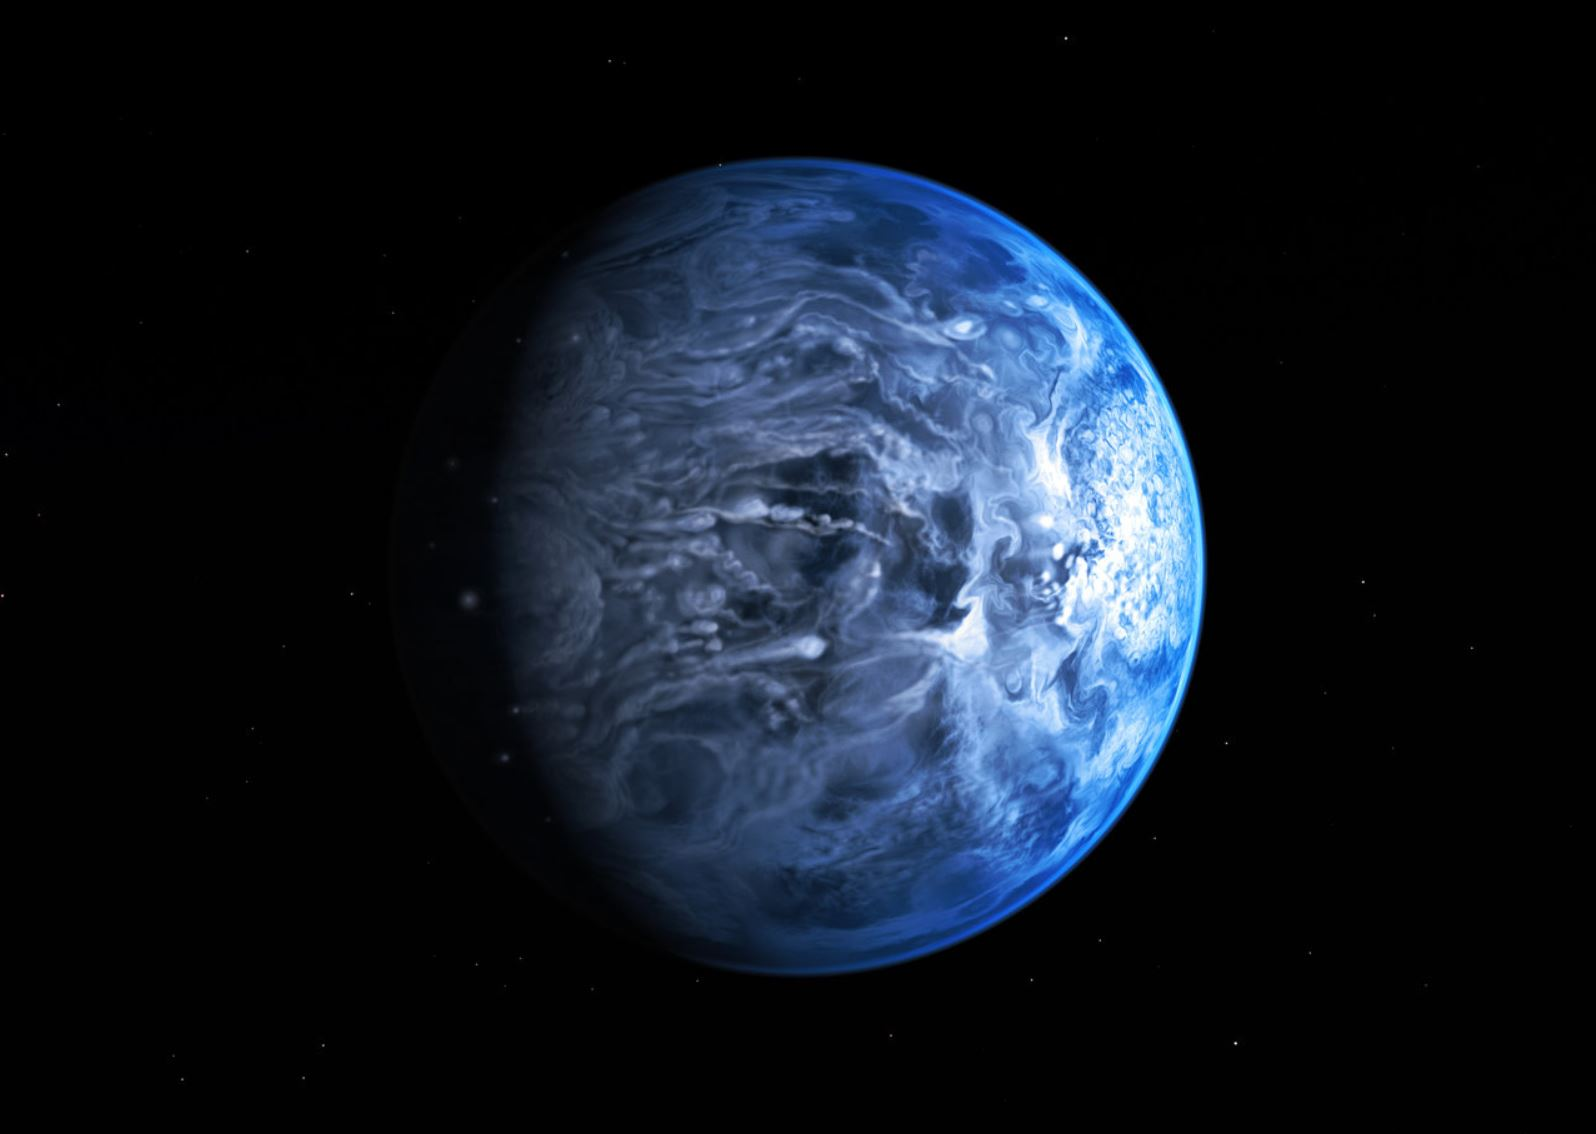 Artist impression of an exoplanet - Image credit: NASA, ESA, M. Kornmesser